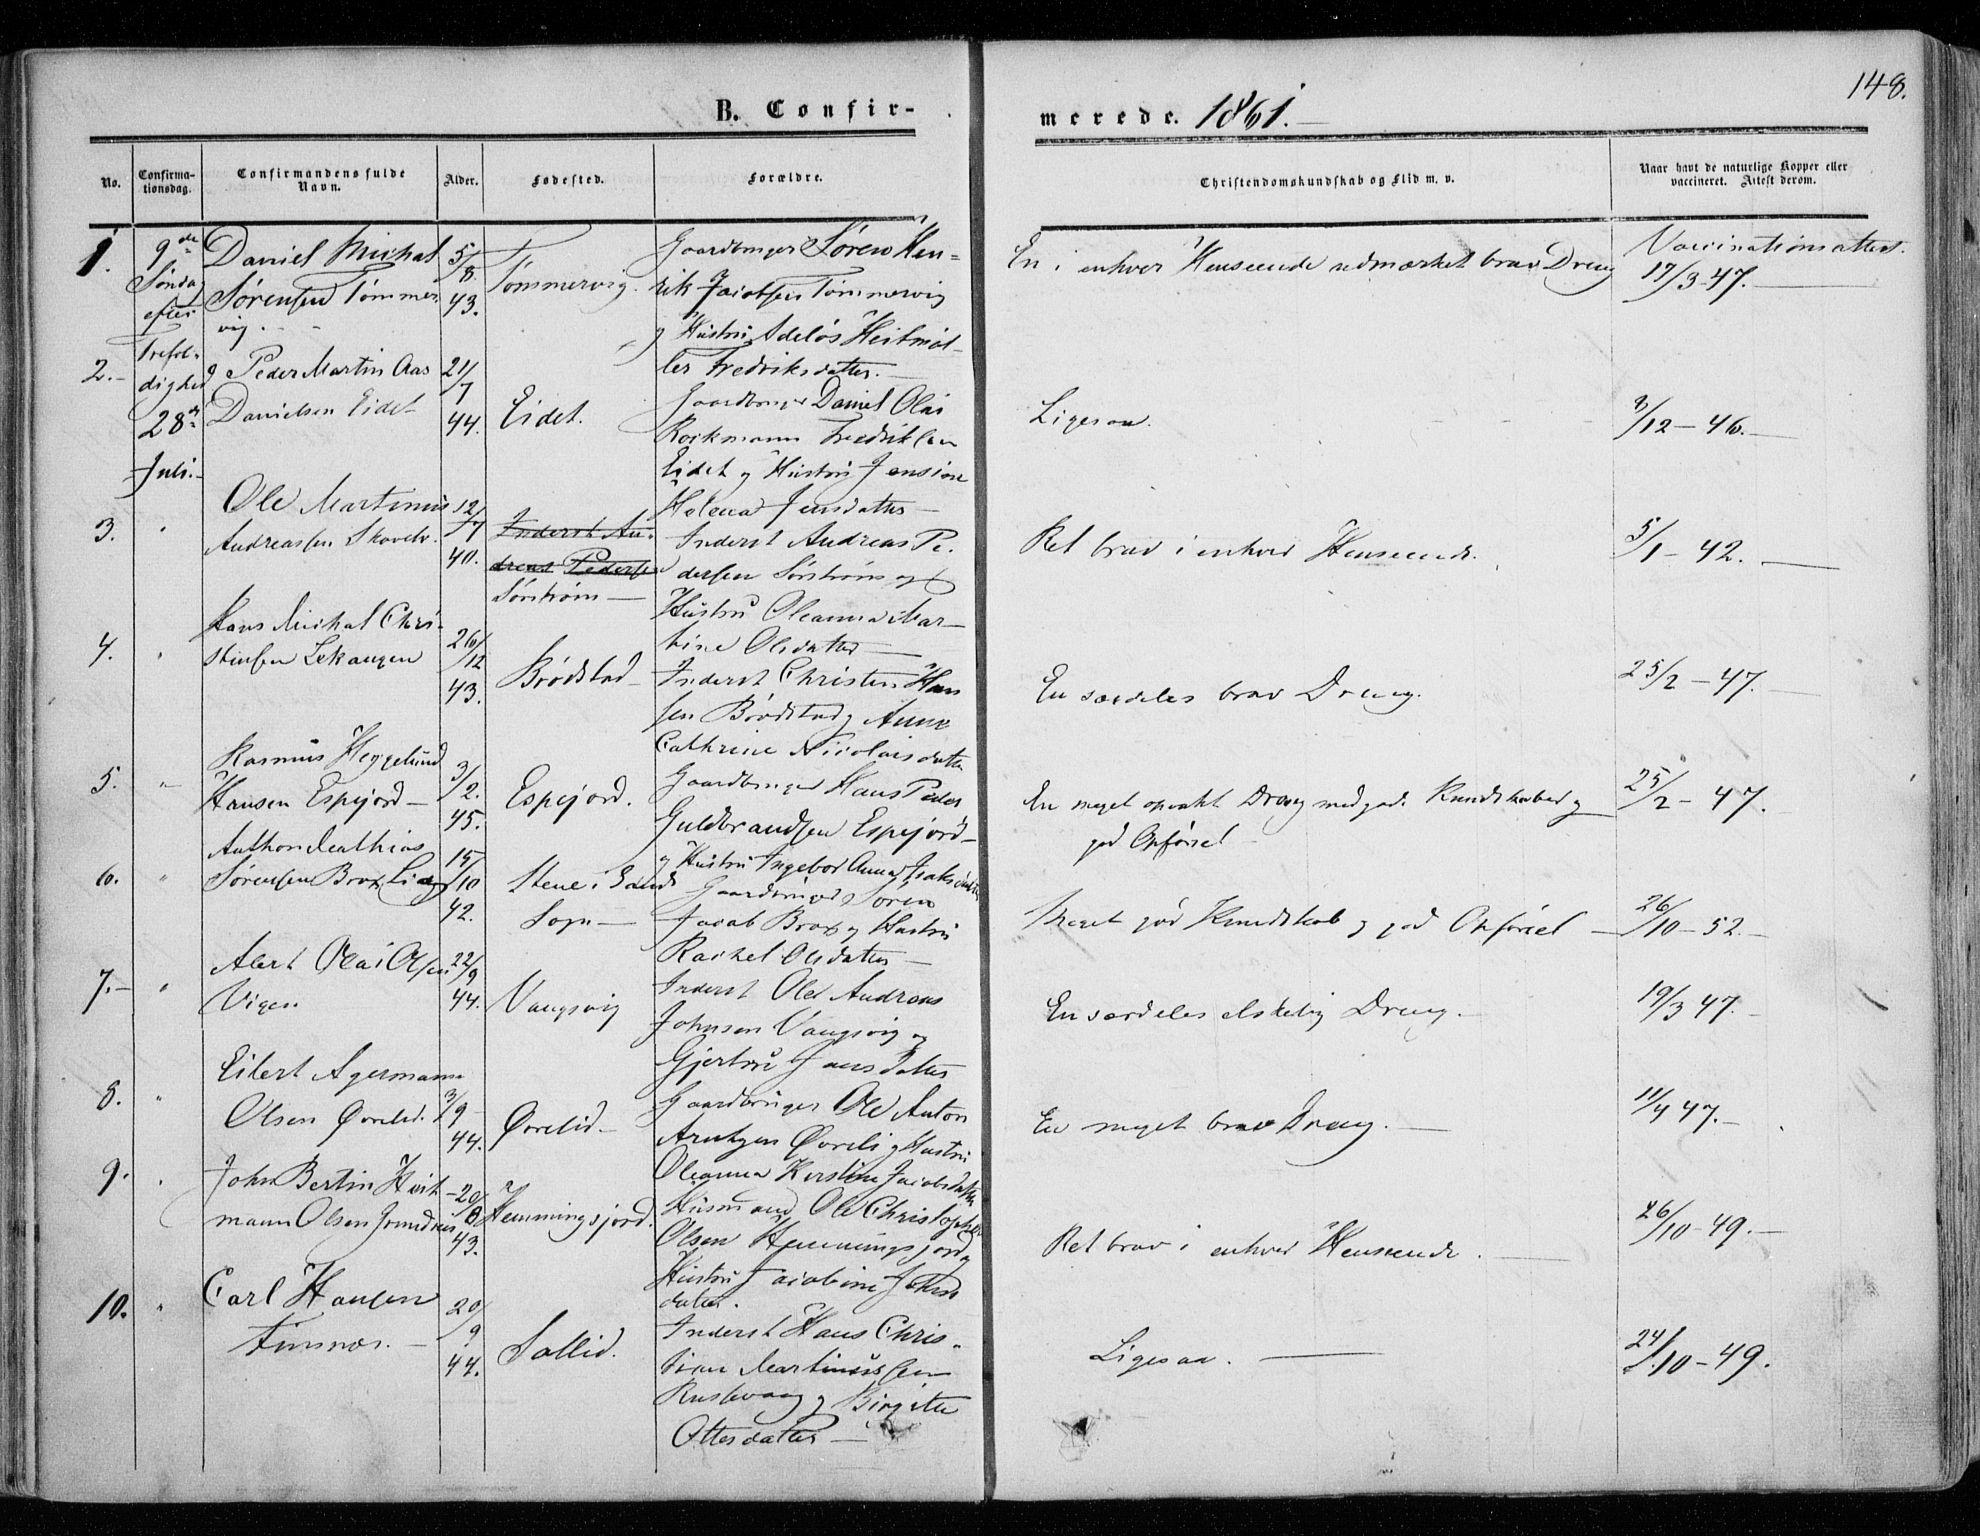 SATØ, Tranøy sokneprestkontor, I/Ia/Iaa/L0007kirke: Ministerialbok nr. 7, 1856-1866, s. 148